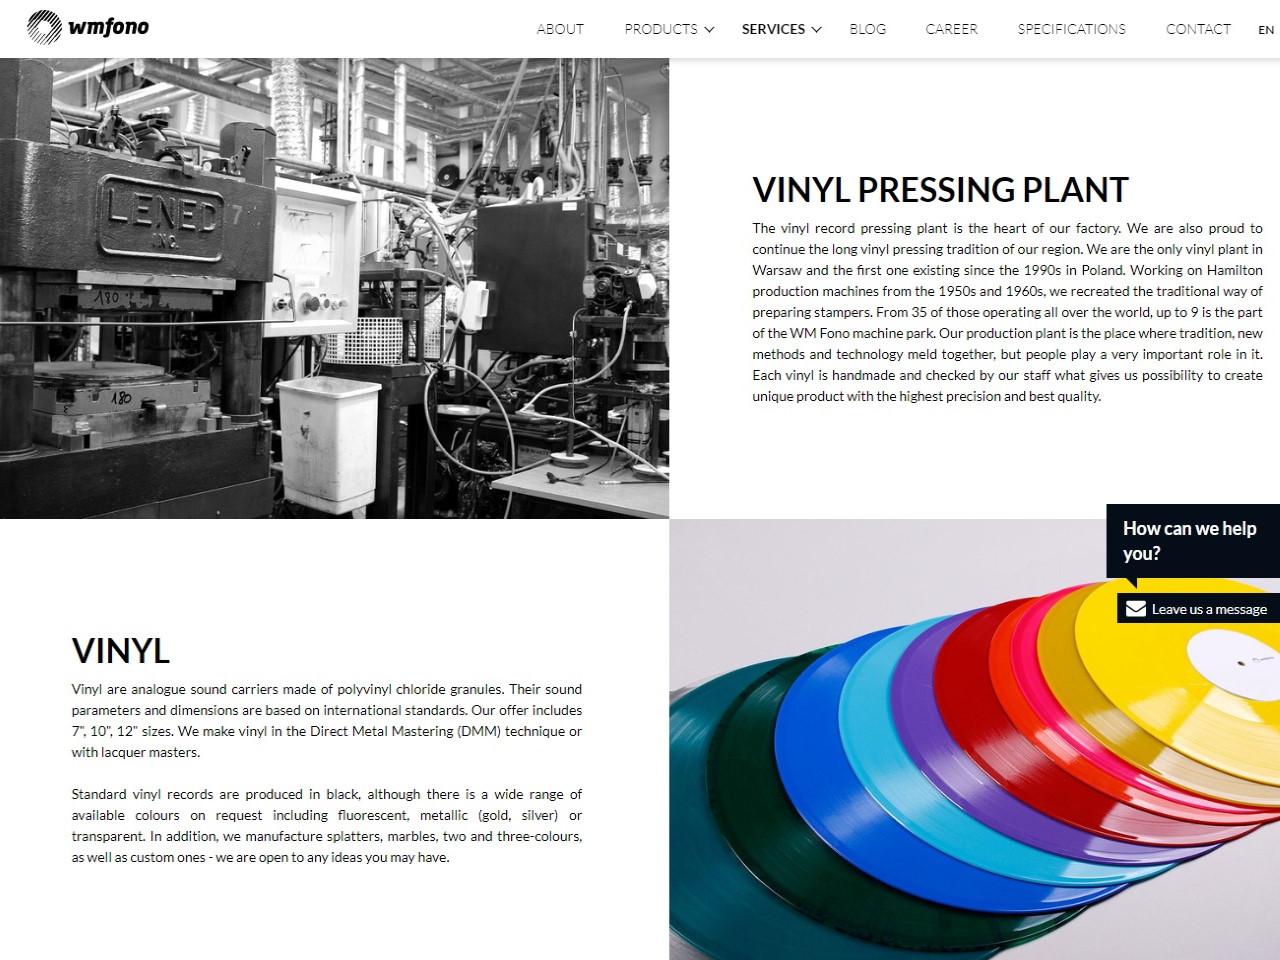 wmfono poland vinyl pressing